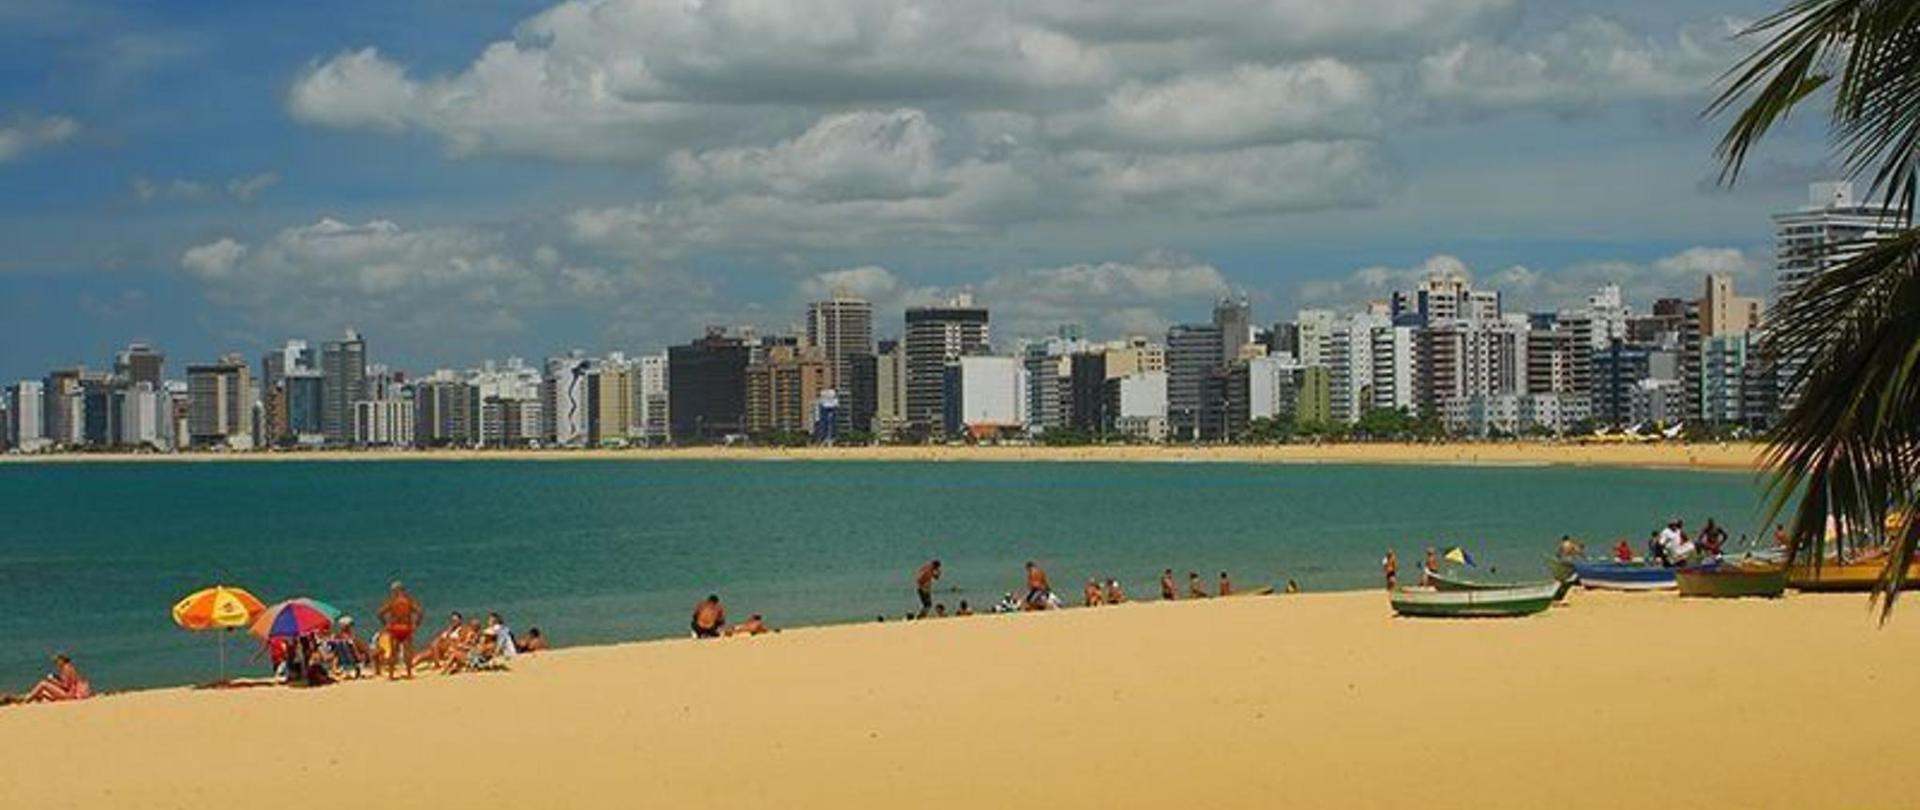 homepage-praia-da-costa.jpg